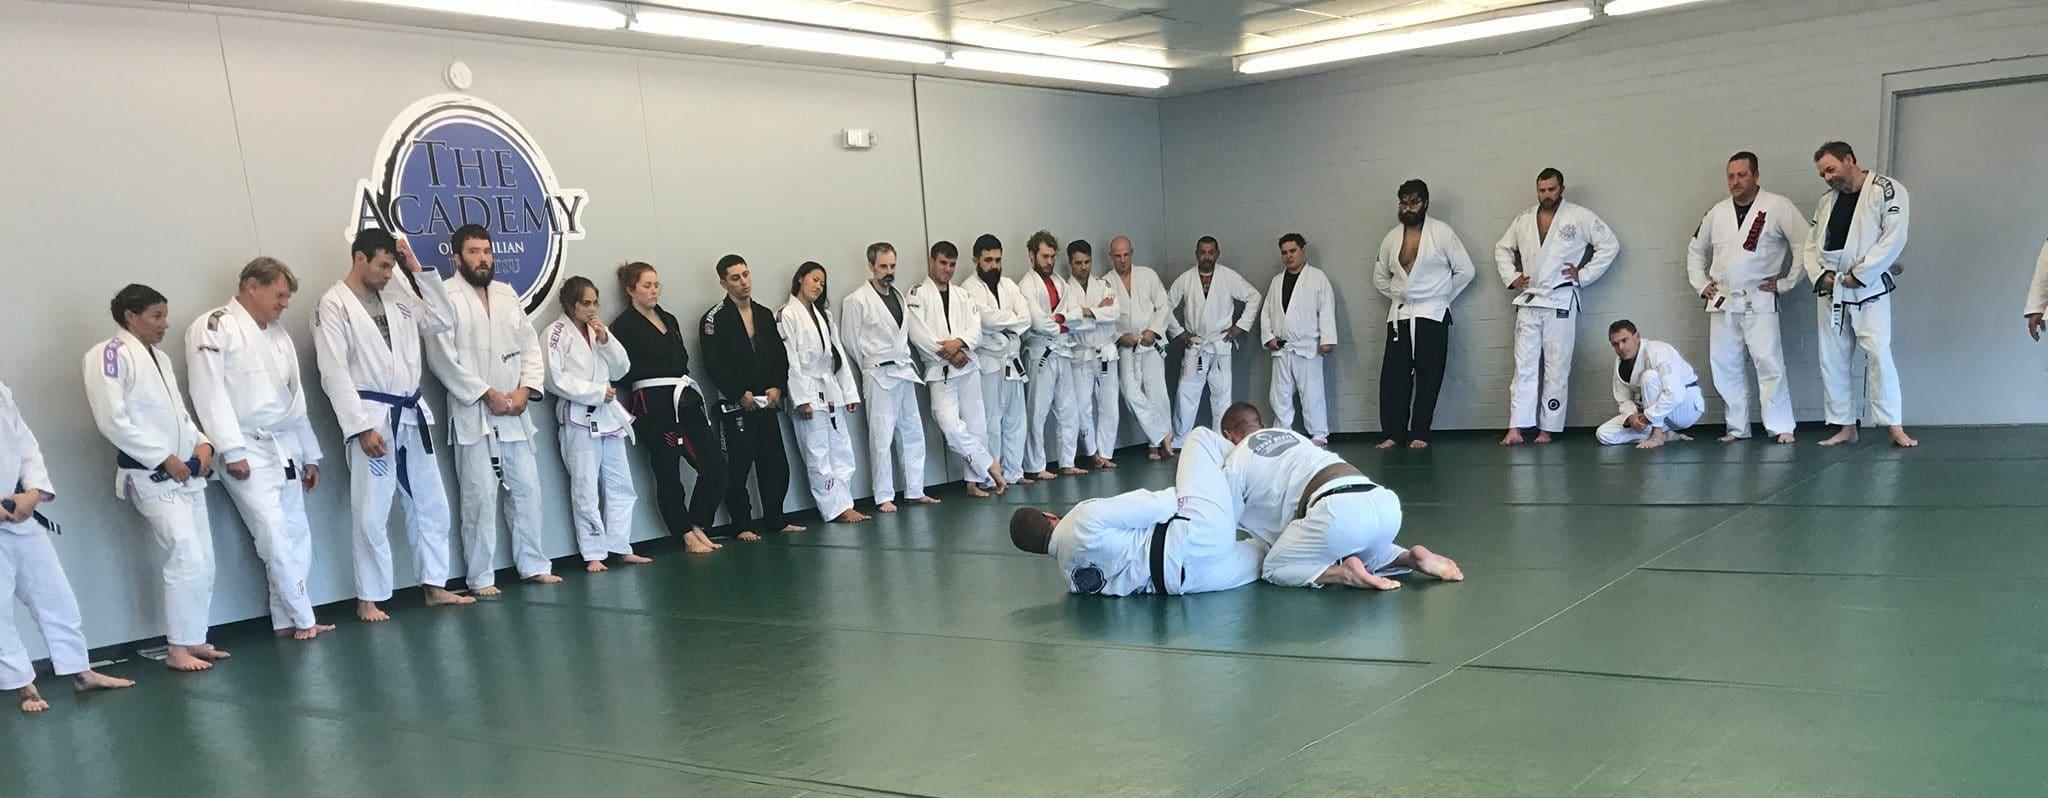 Arvada Brazilian Jiu Jitsu Special Offers